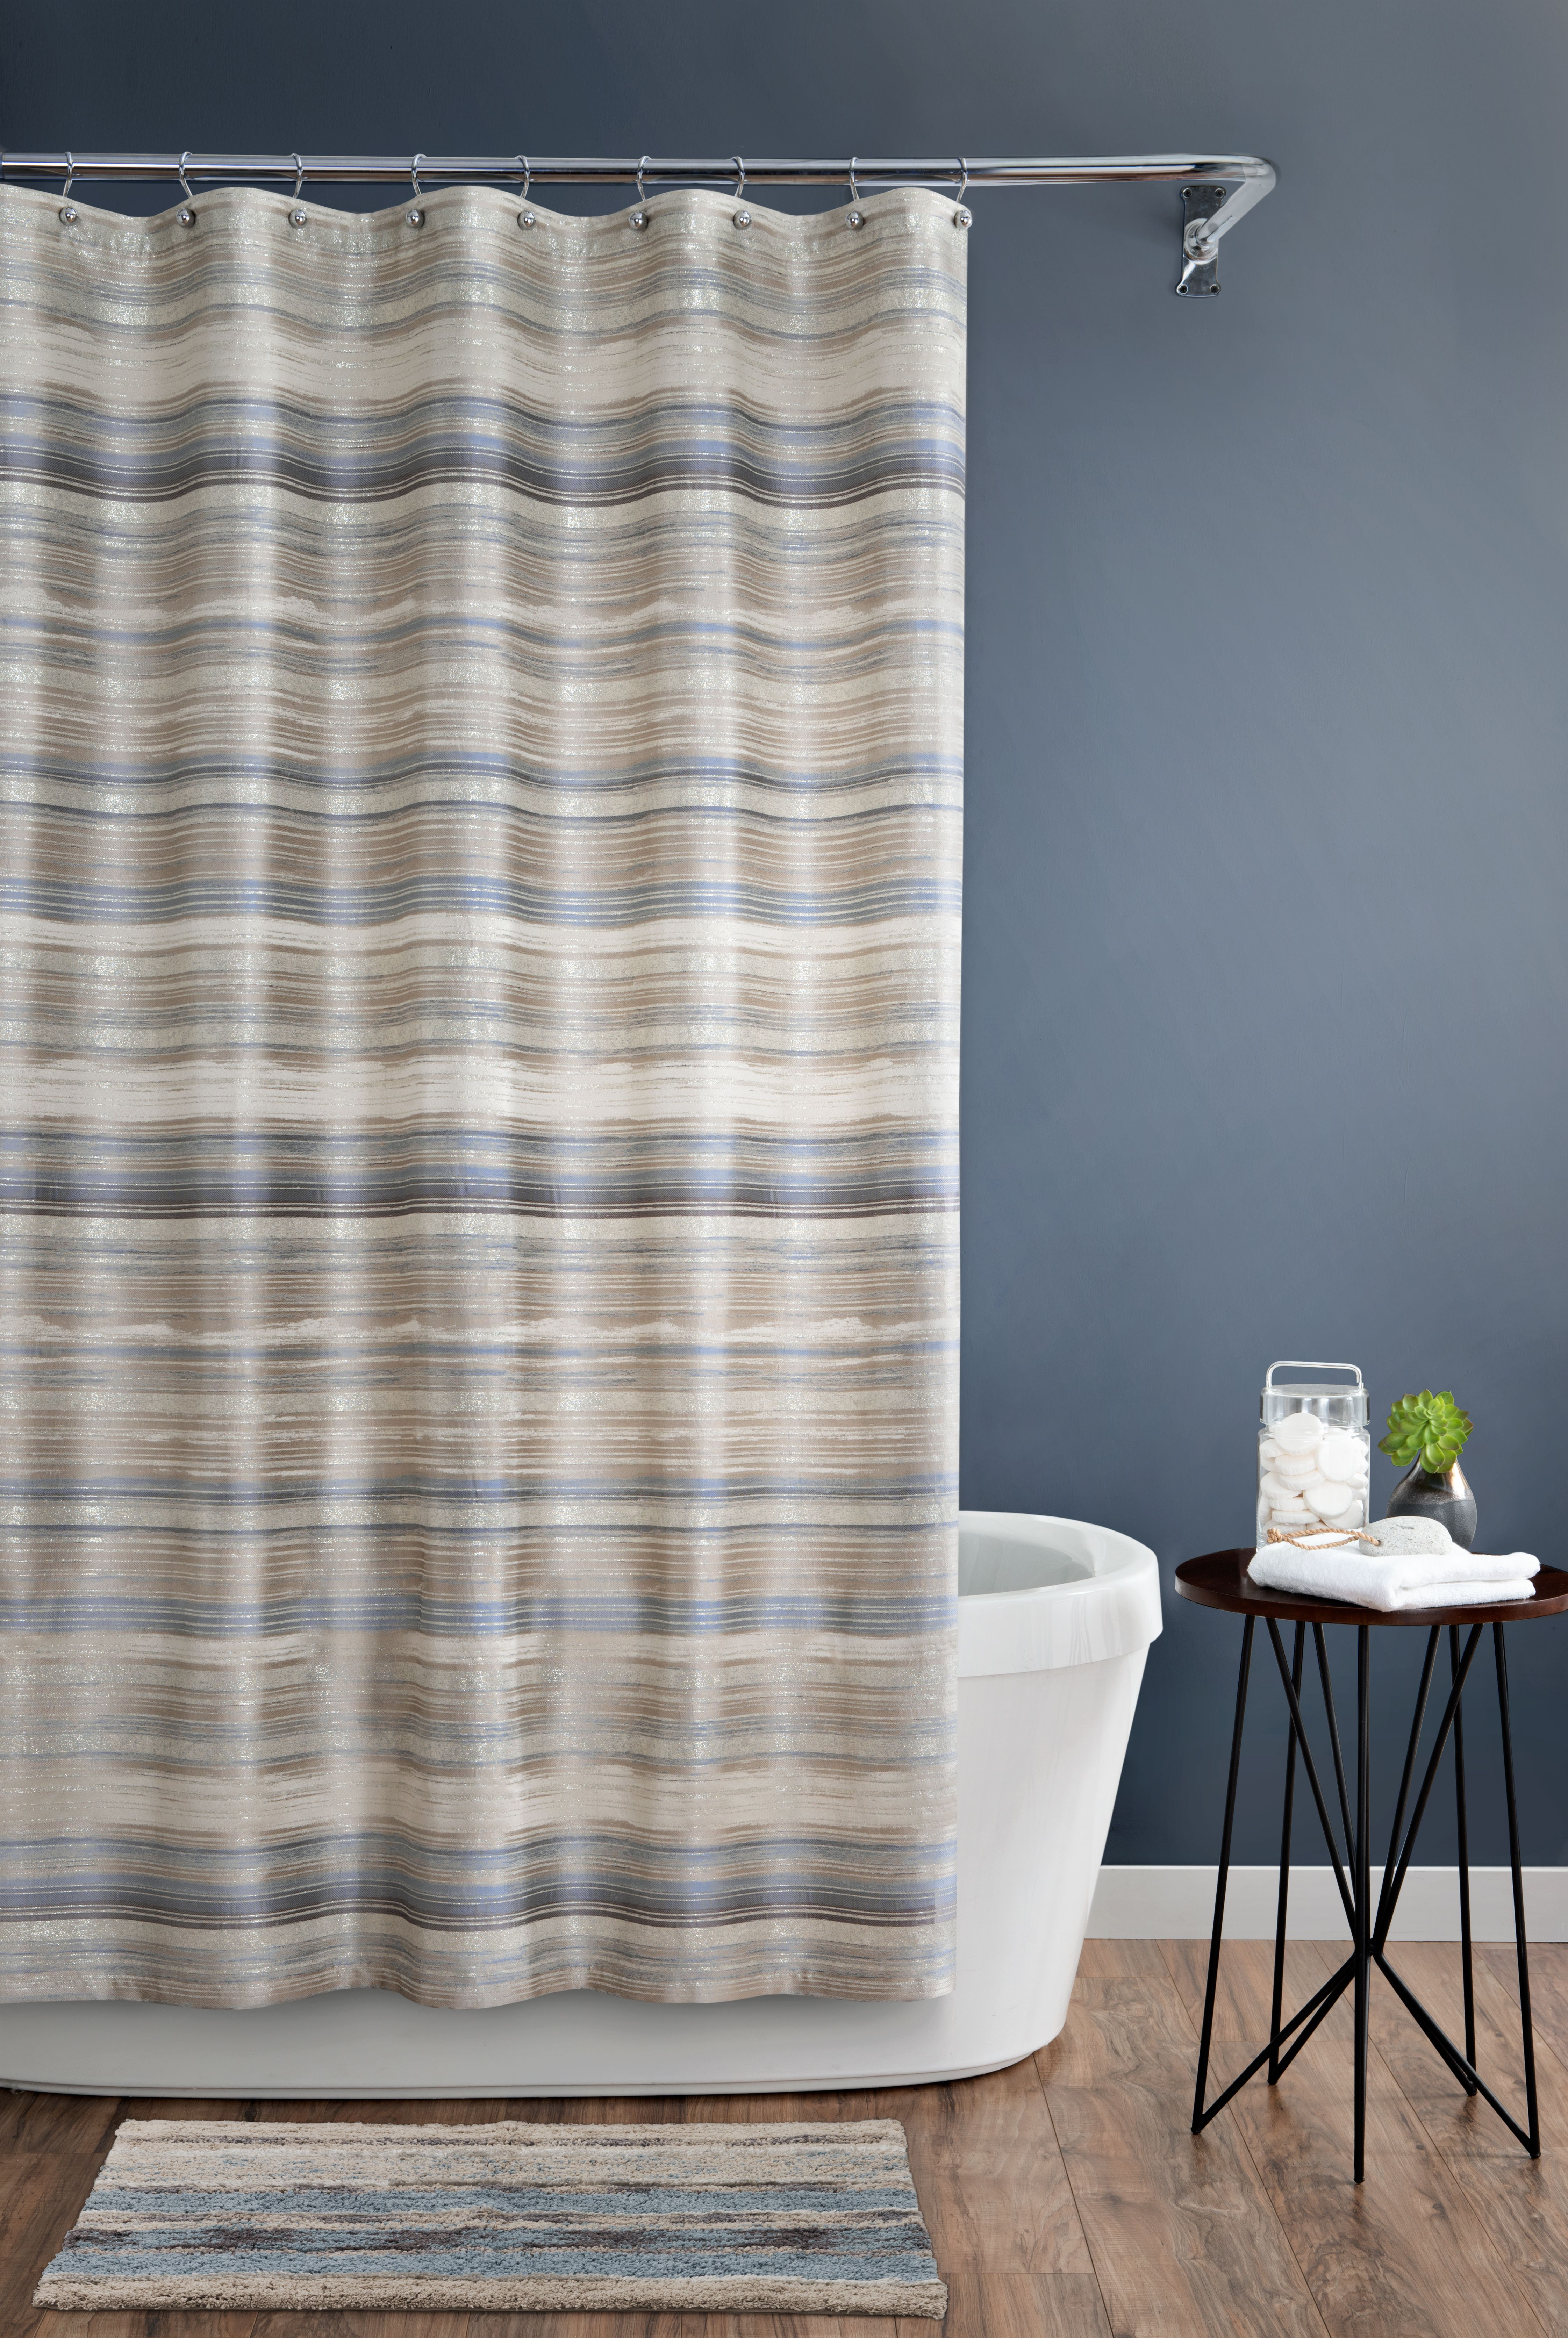 Darian Shower Curtain 72x72 Long Shower Curtains Extra Long